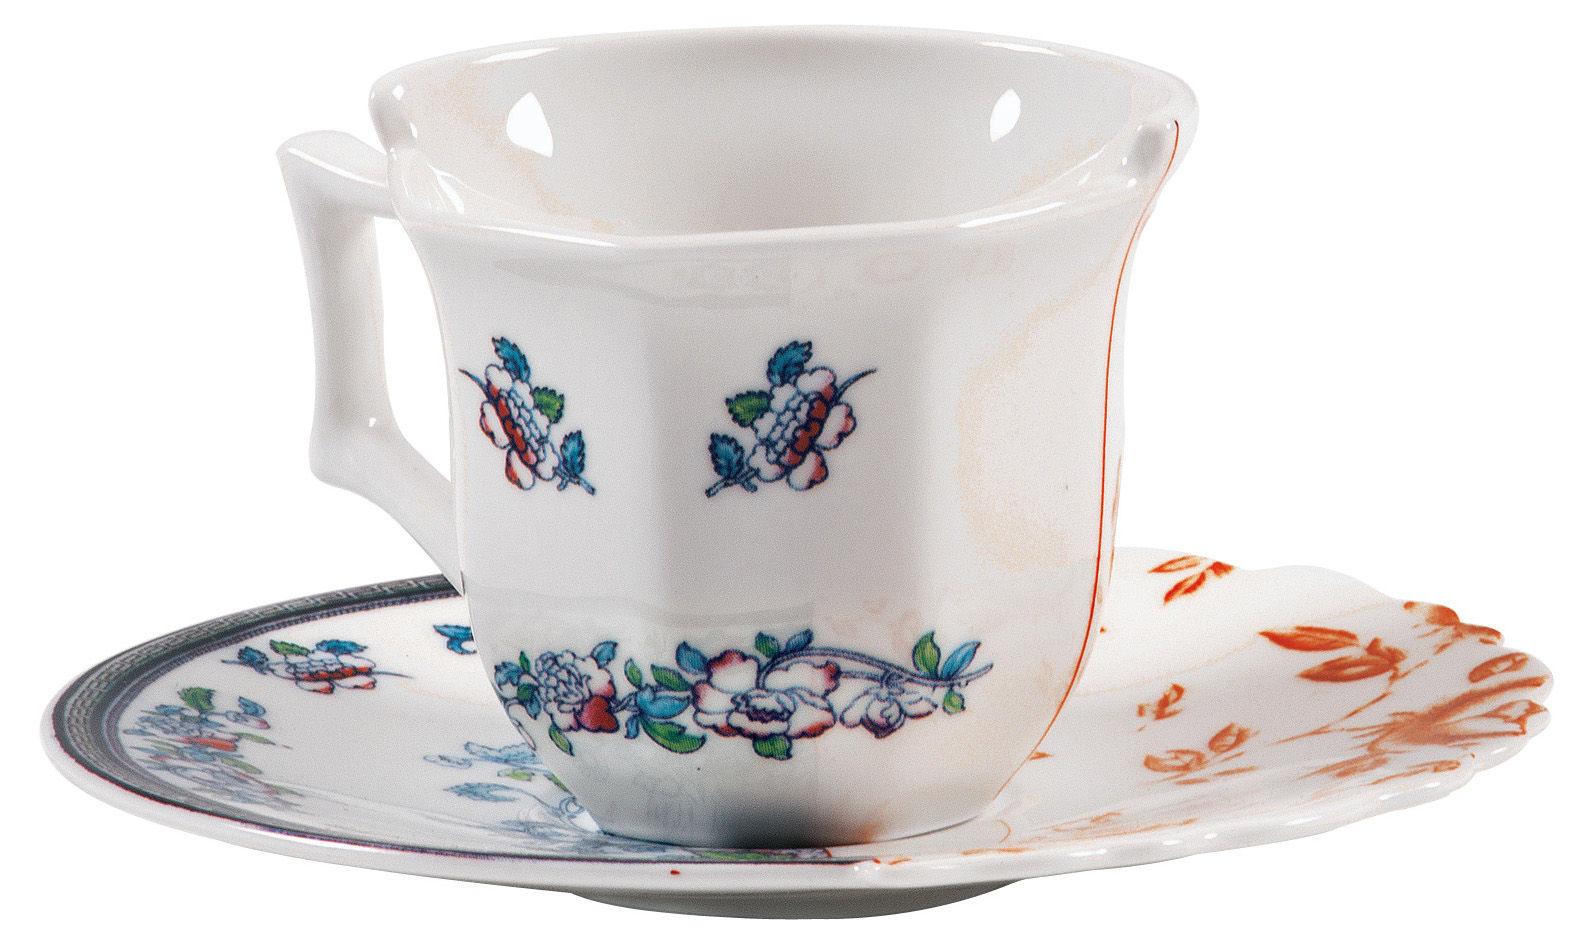 Tischkultur - Tassen und Becher - Hybrid Leonia Kaffeetasse Set aus Kaffeetasse + Untertasse - Seletti - Leonia - Porzellan